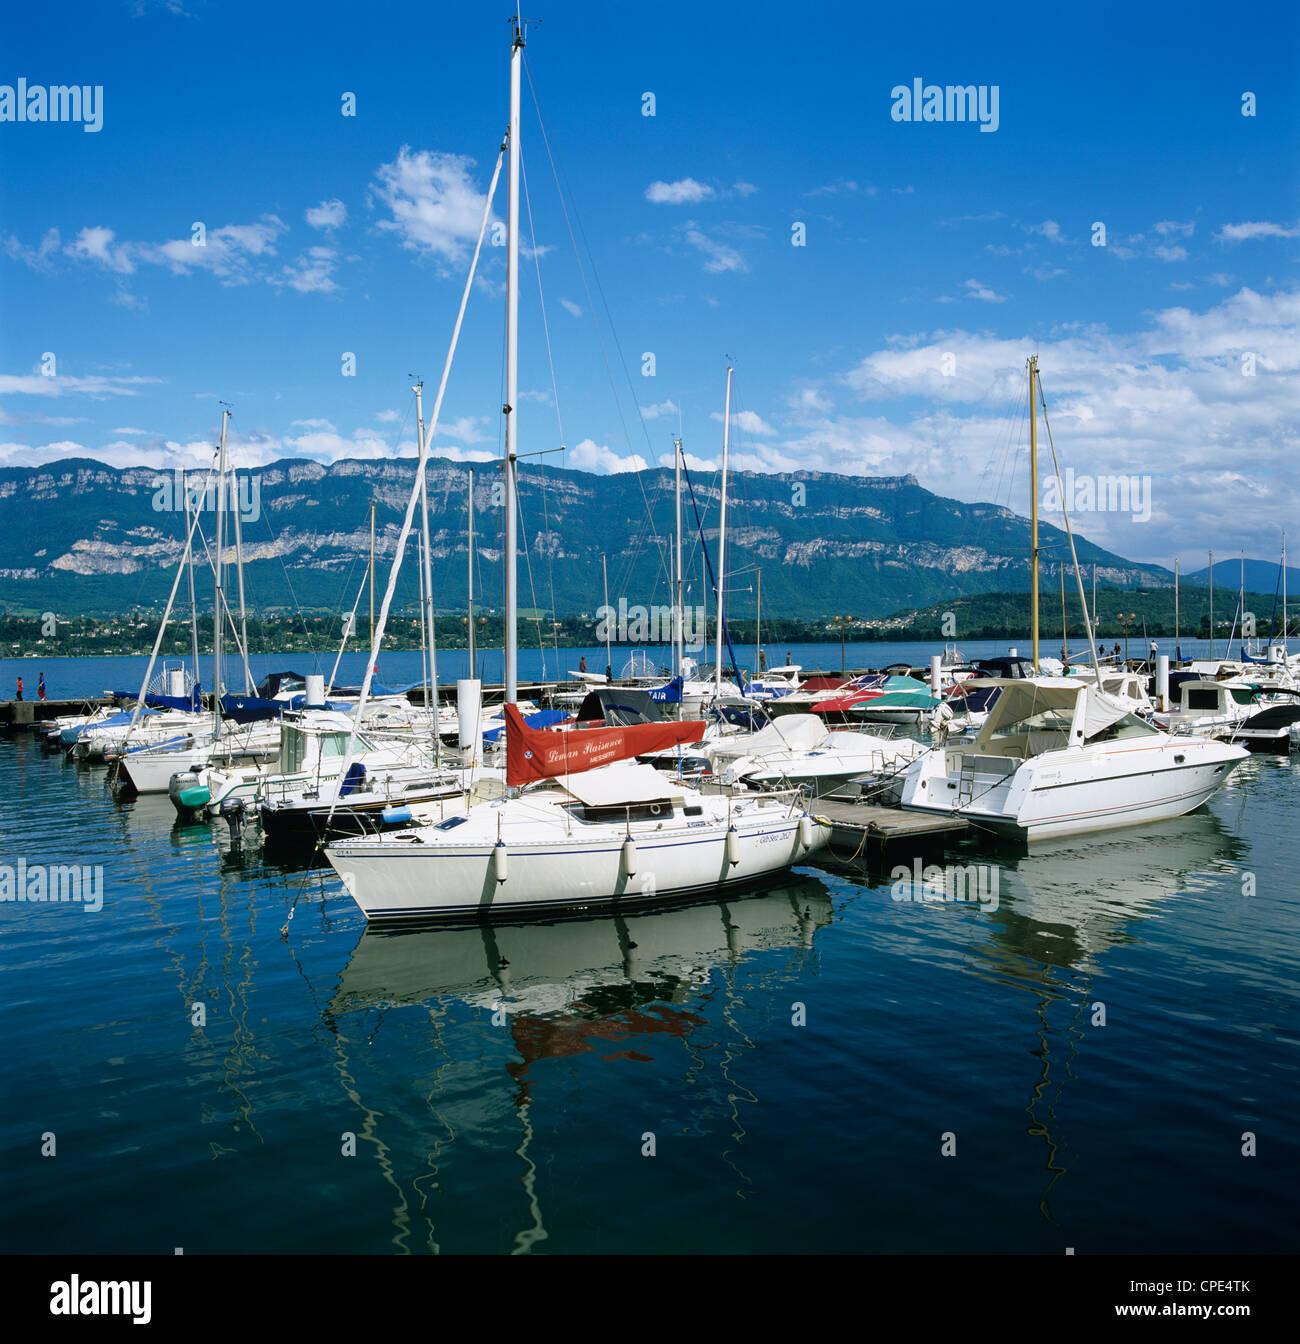 Marina on Lac Du Bourget, Aix les Bains, Rhone Alpes, France, Europe - Stock Image